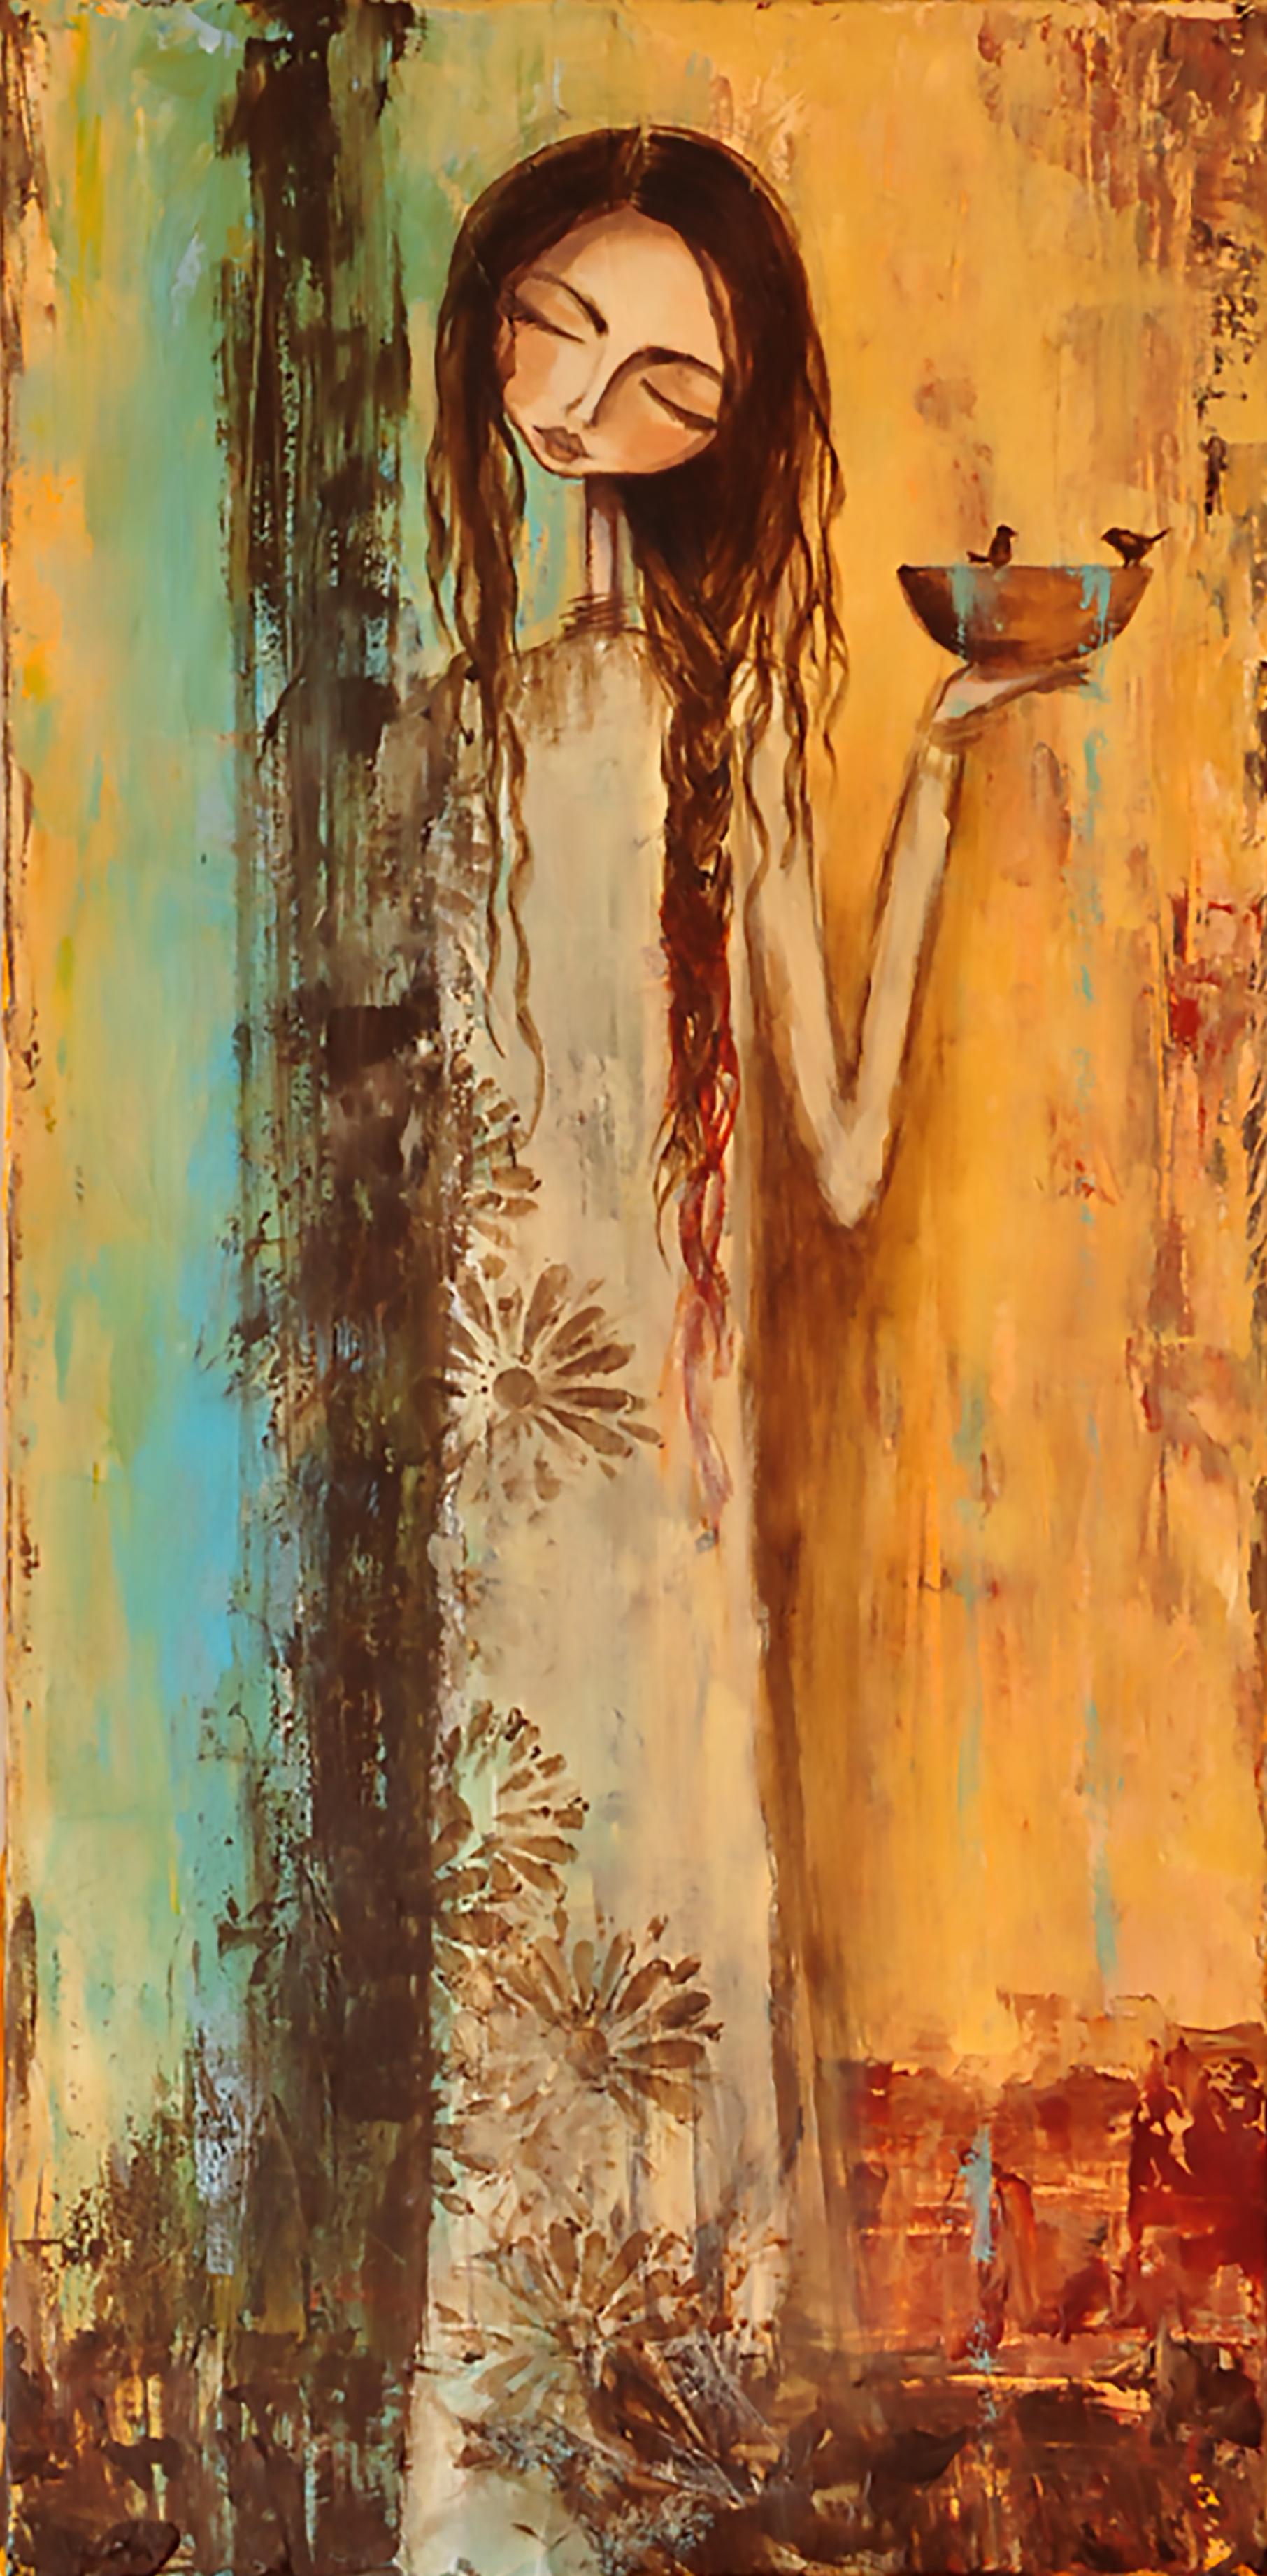 """She Prayed for Rain""   12"" x 24"" Original Tissue & Acrylic on Canvas    $375.00"